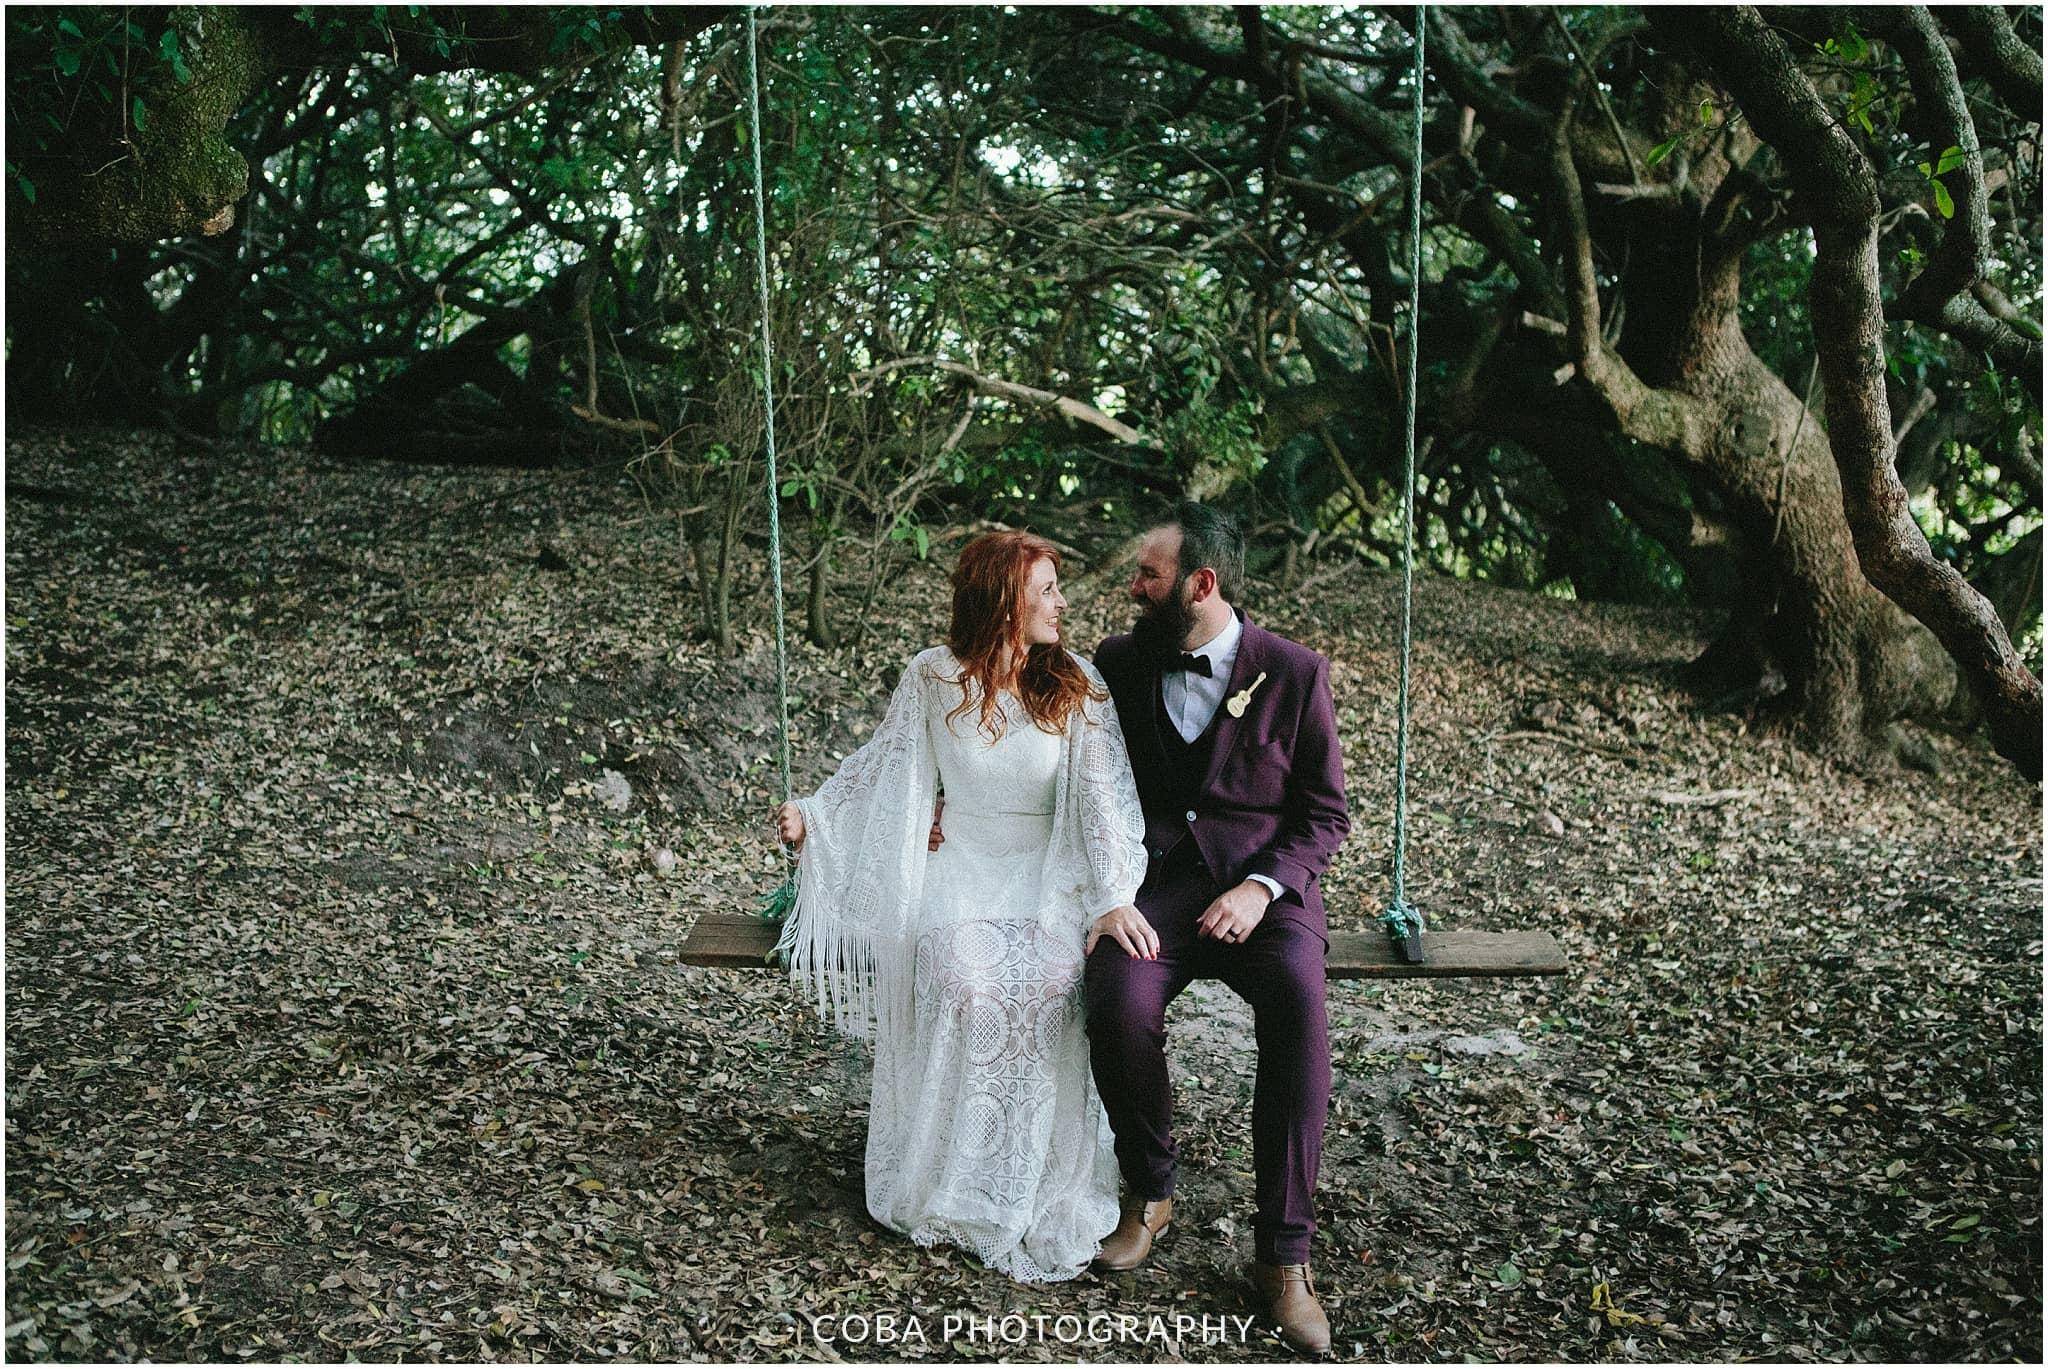 Conrad & Mareli - boho wedding - onrus (17)